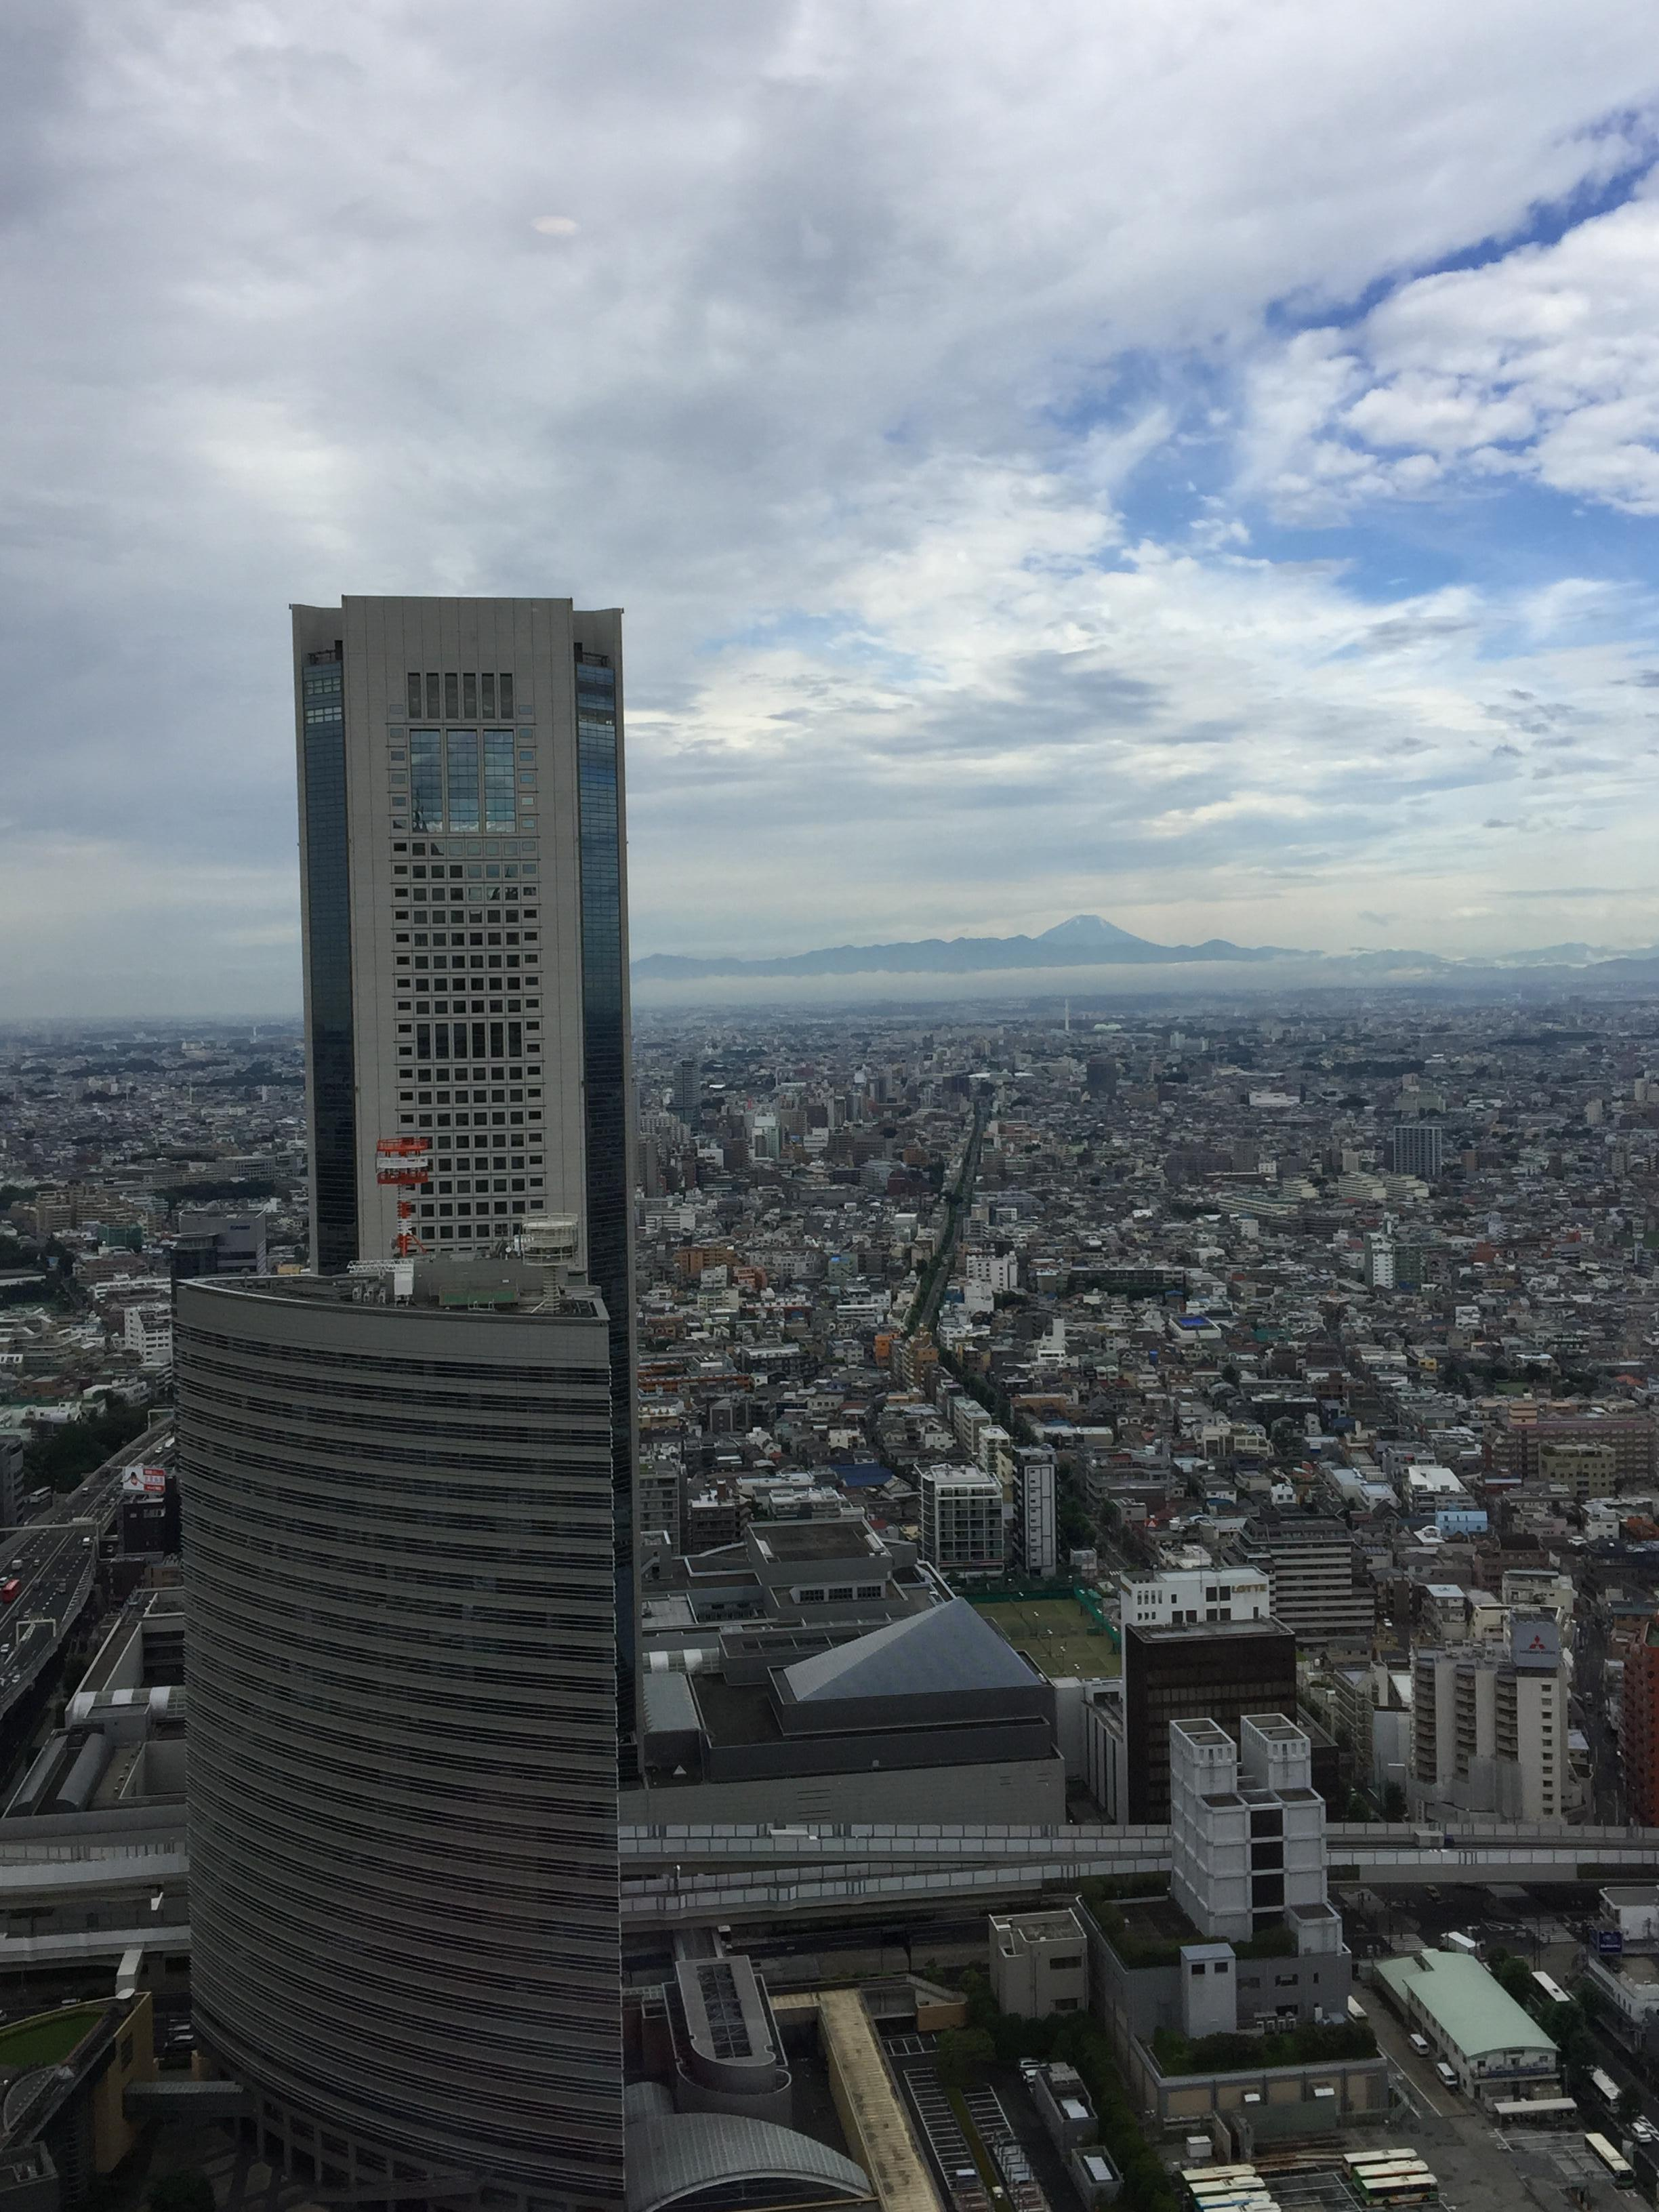 Fuji, finally!